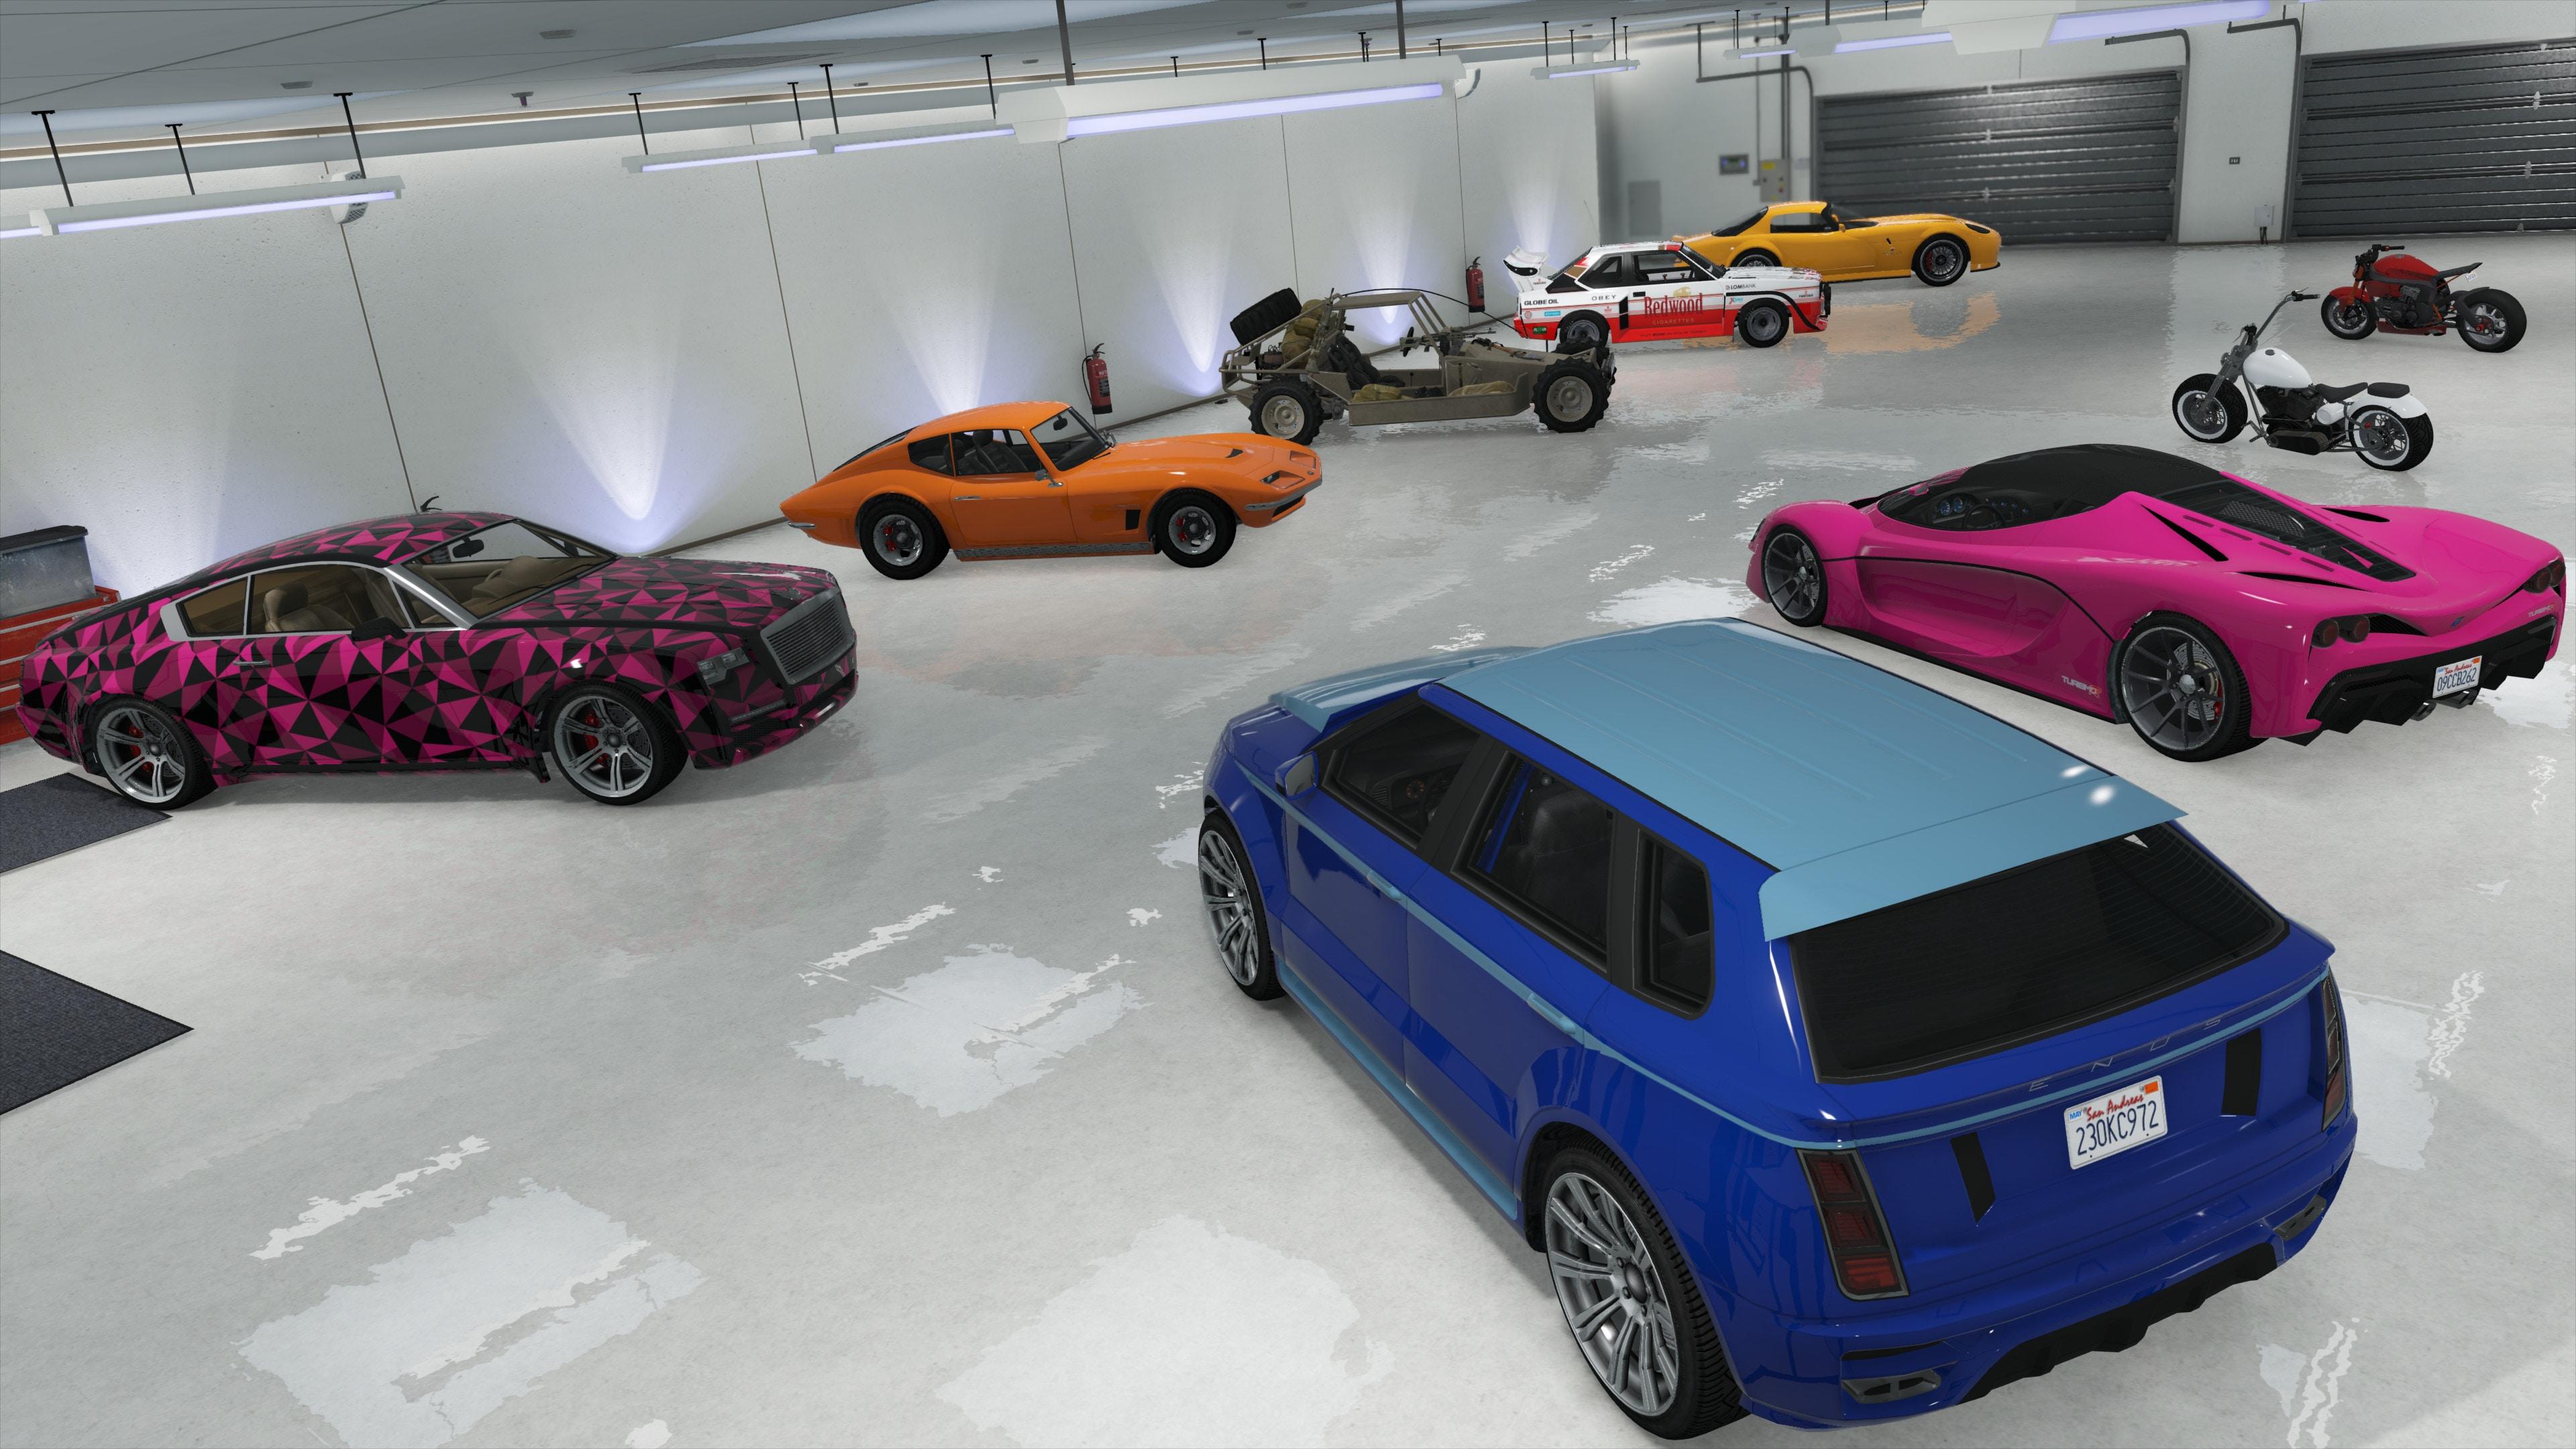 Grand Theft Auto V - Criminal Enterprise Starter Pack (PC) - Rockstar Key - GLOBAL - 4